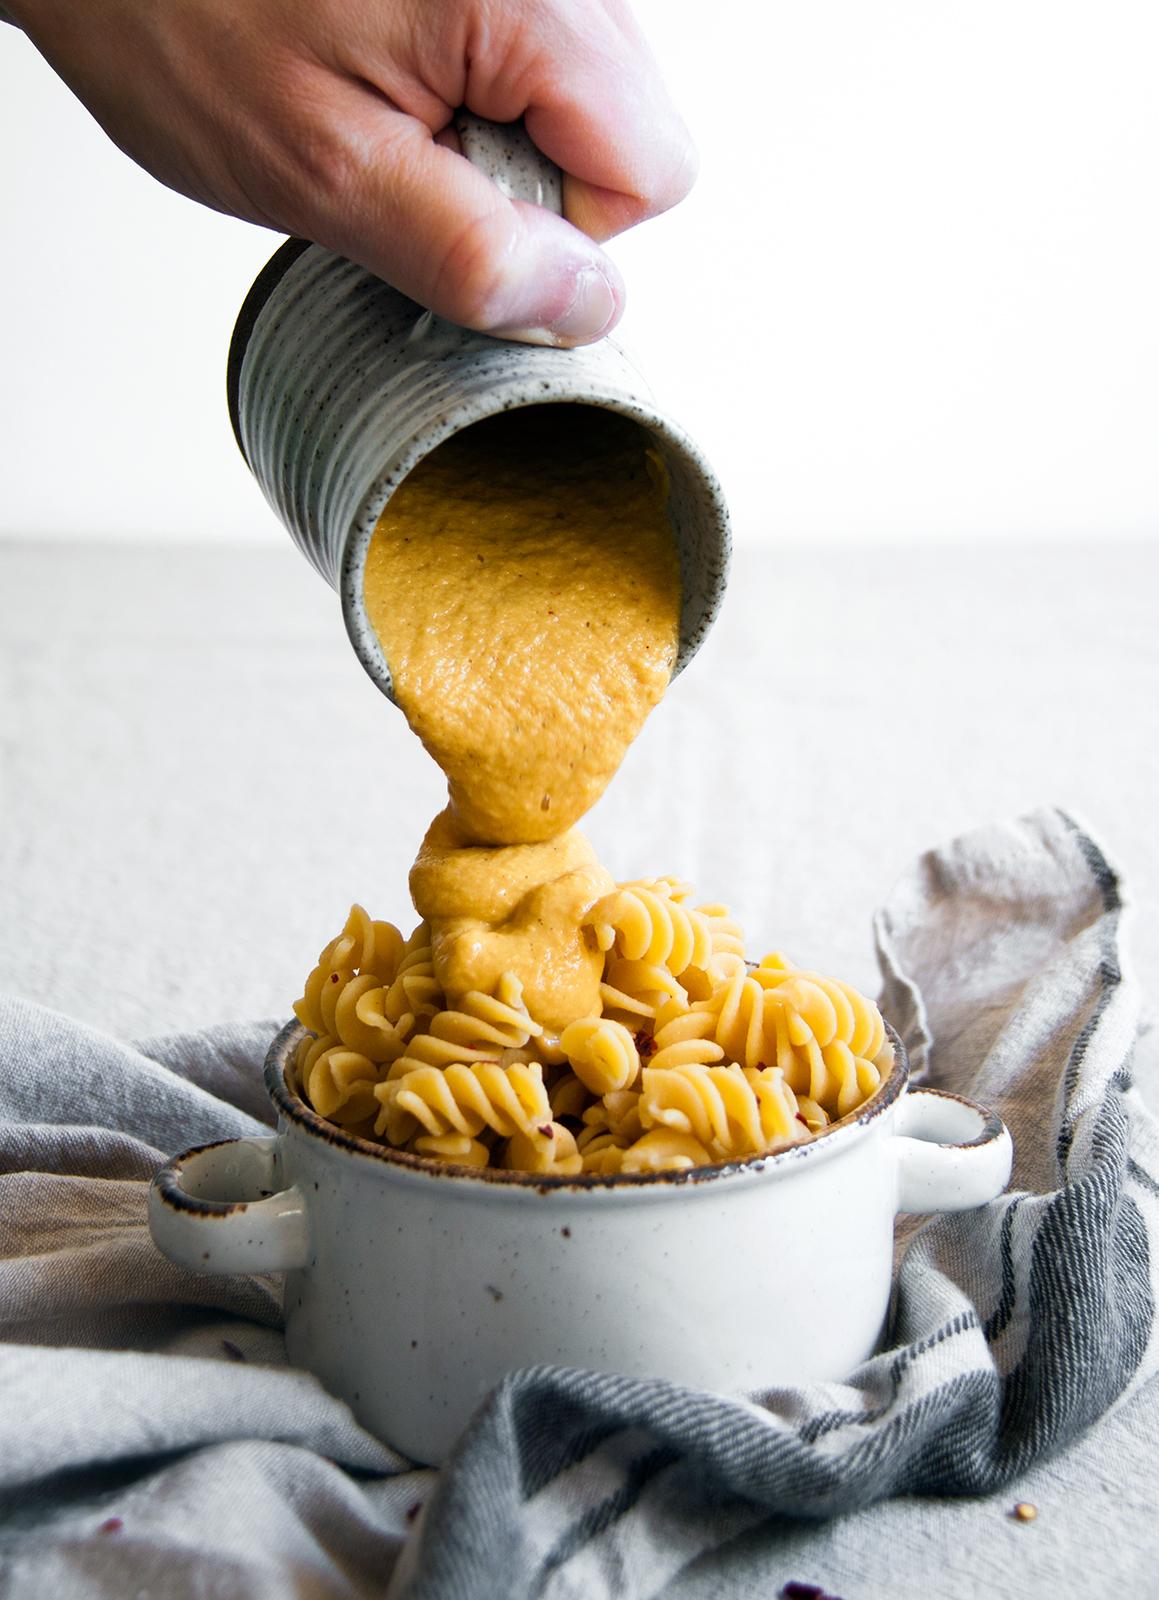 mac-cheese-pompoen-vegan-whole-foods-olievrij-notenvrij-glutenvrije-optie-02.jpg